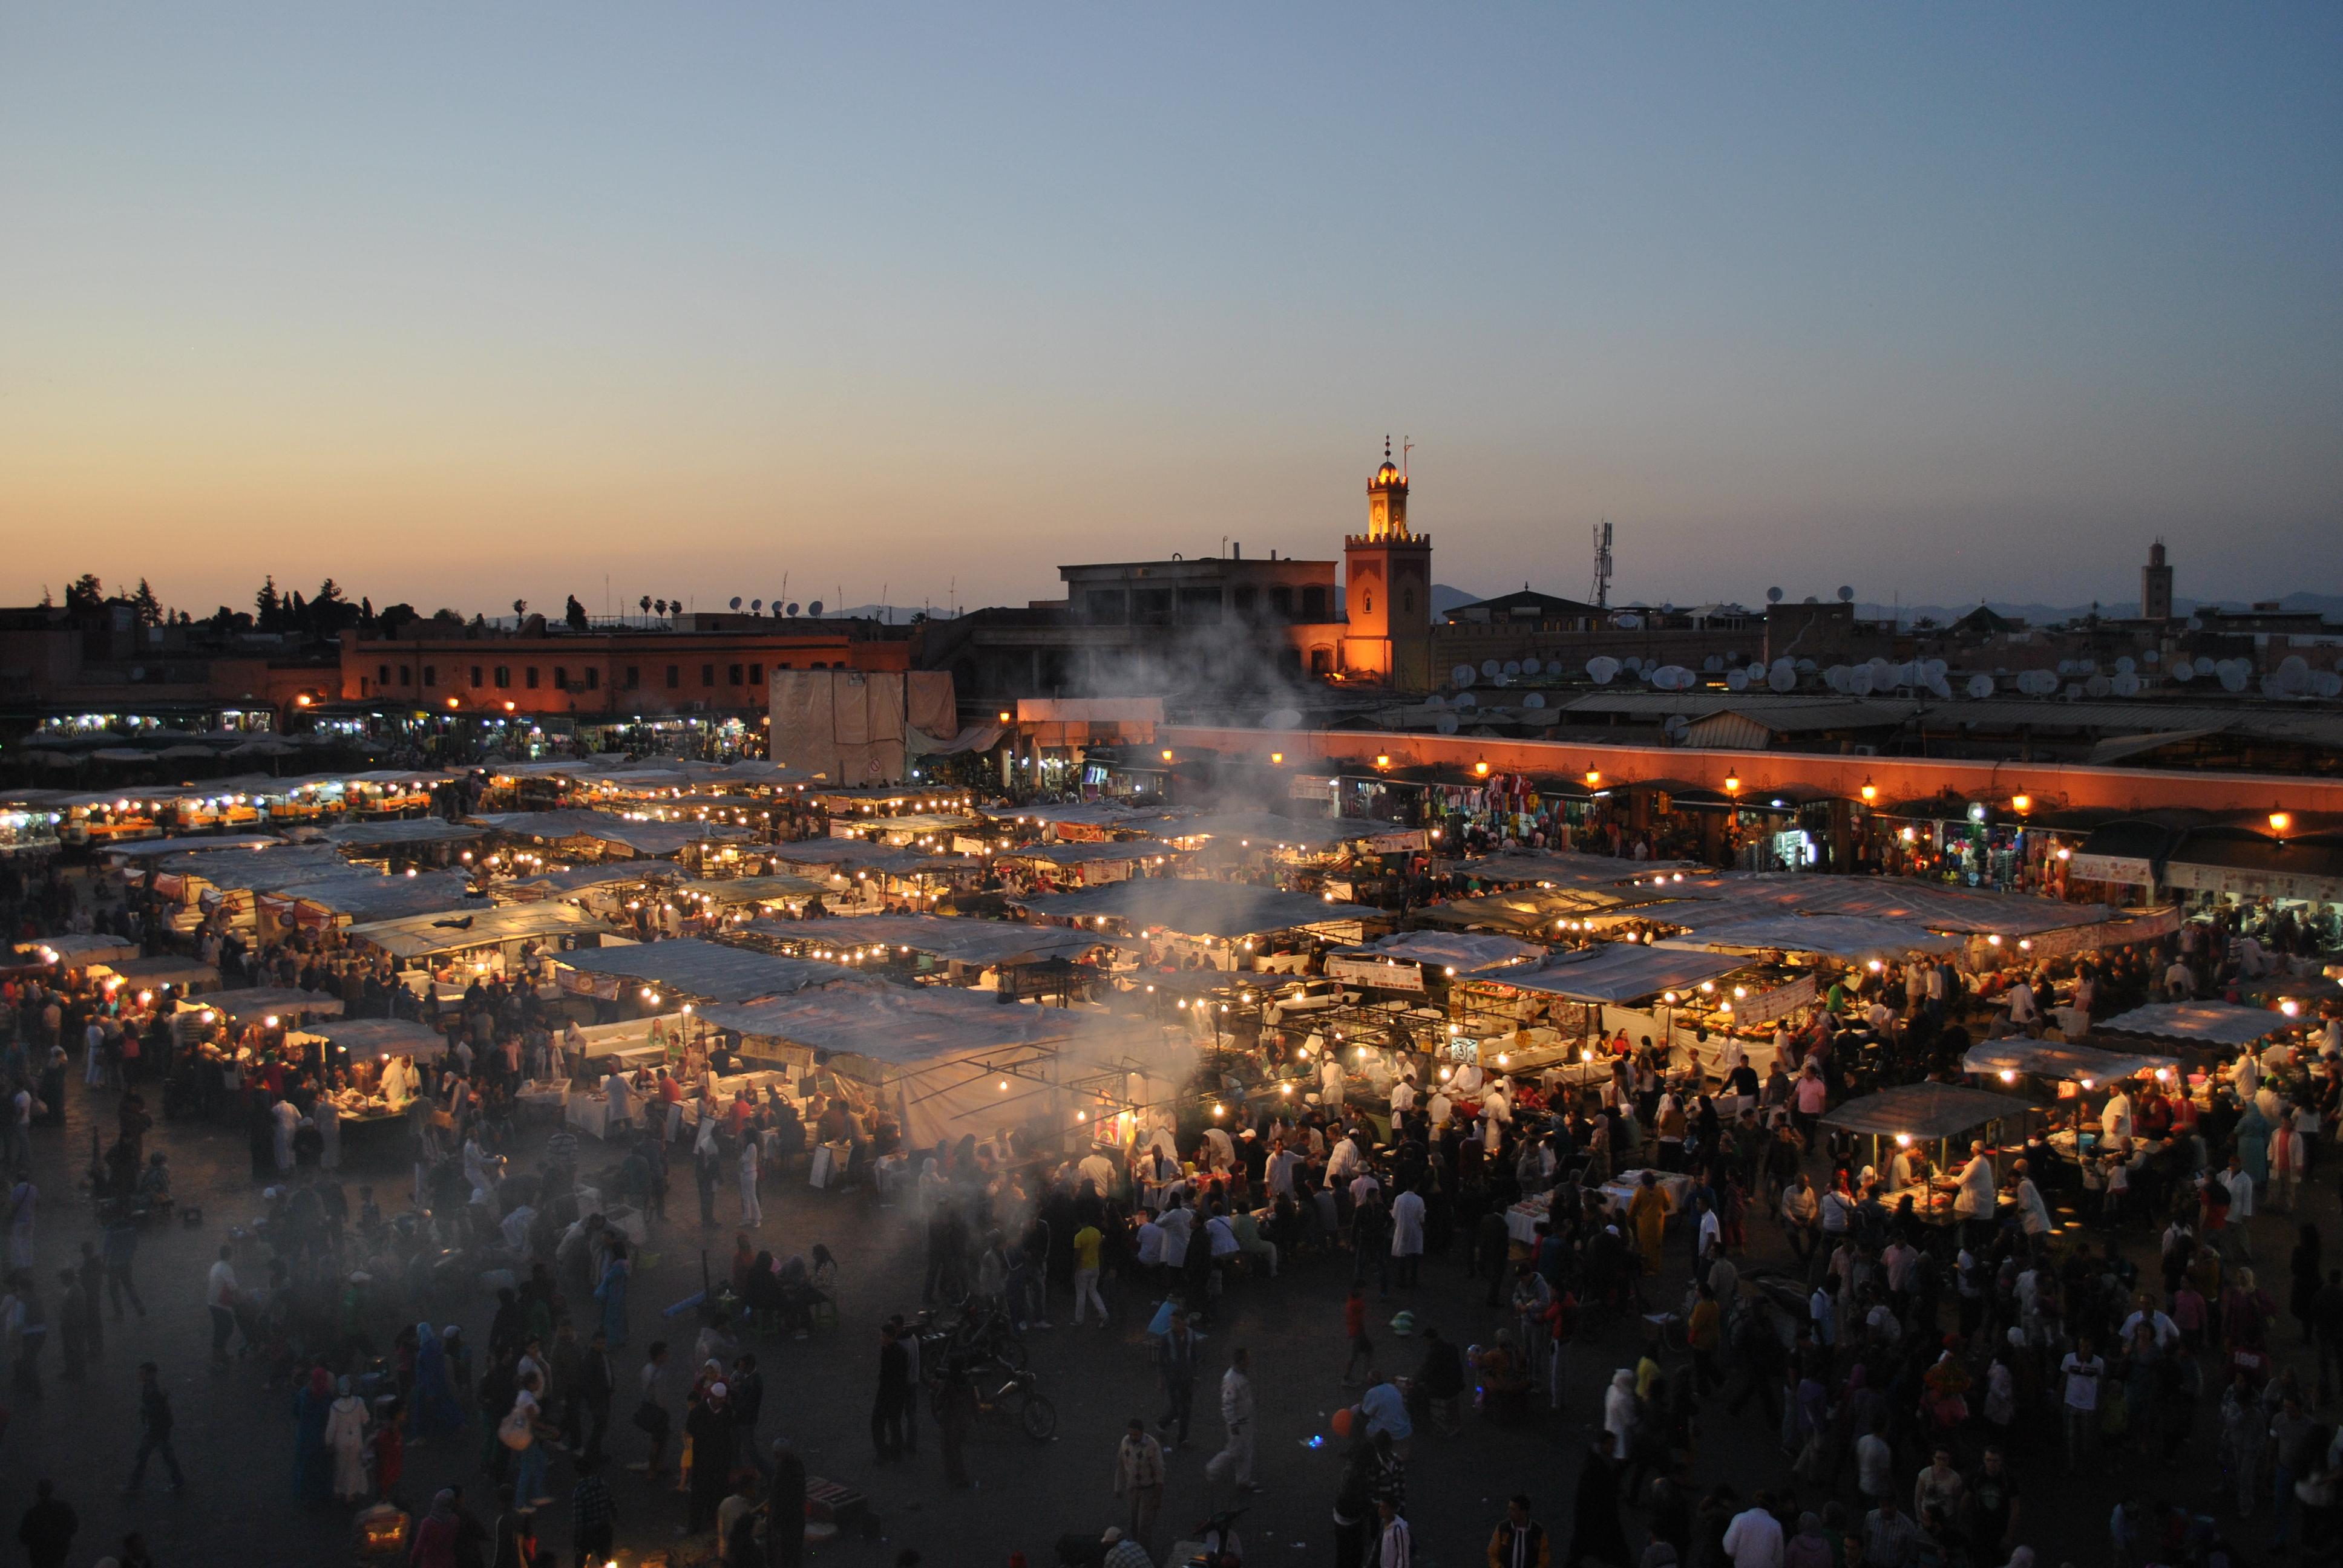 Cala la sera su Piazza Djemaa el Fna